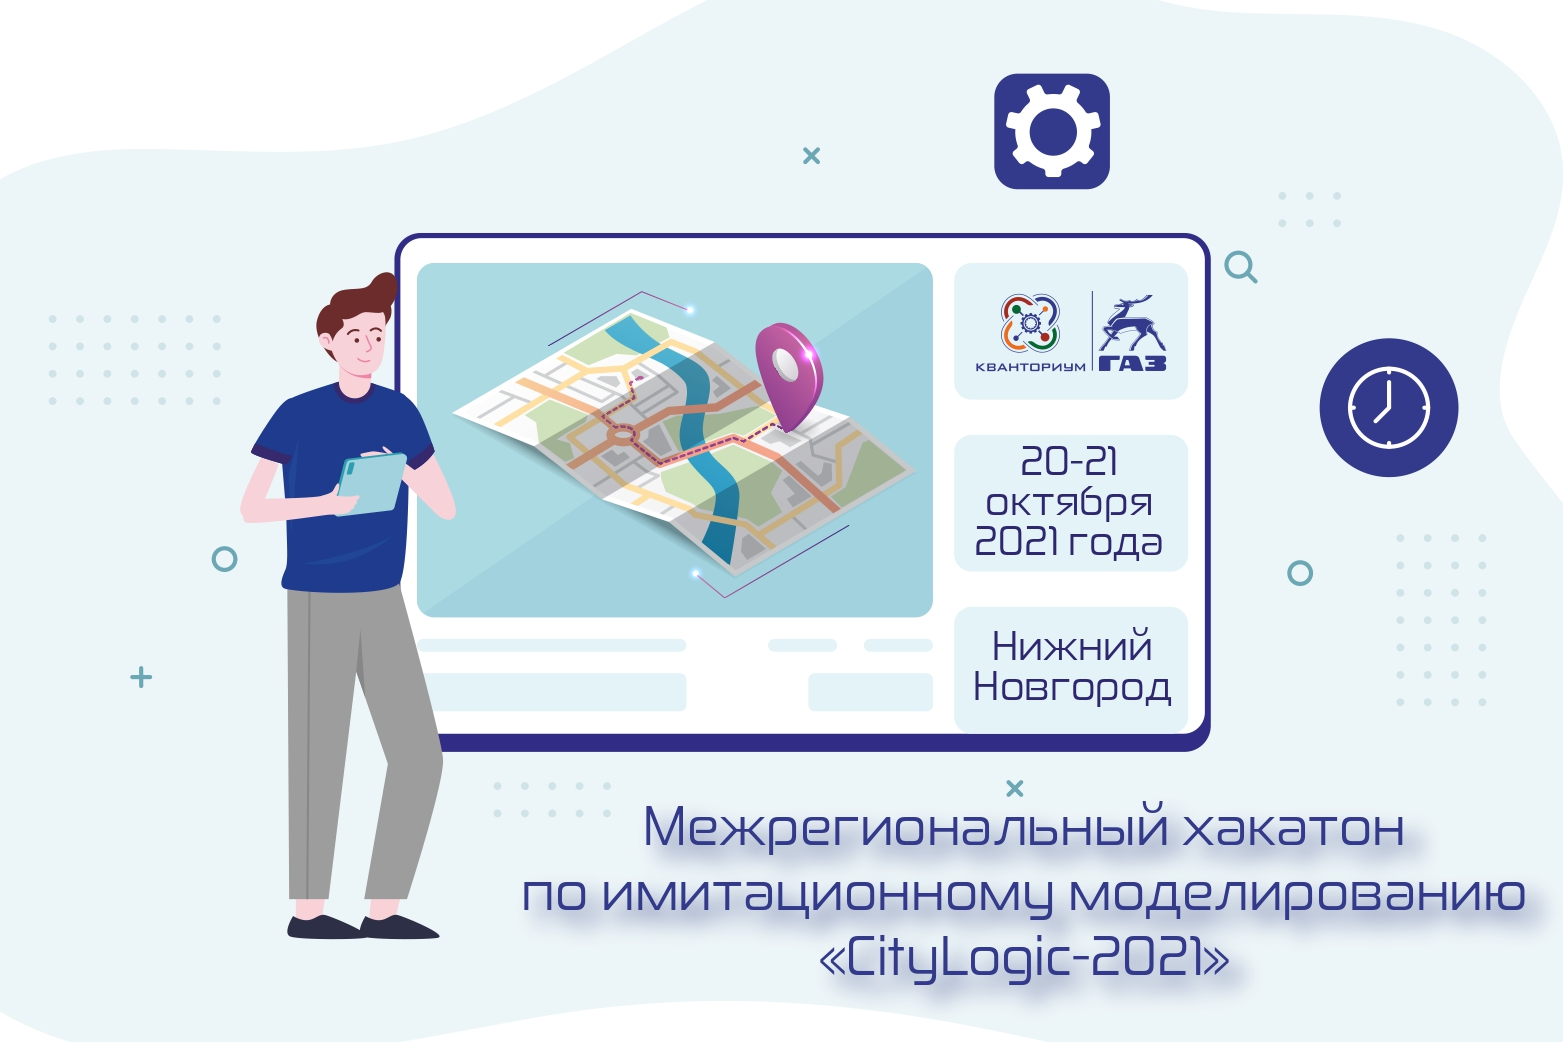 CityLogic-2021